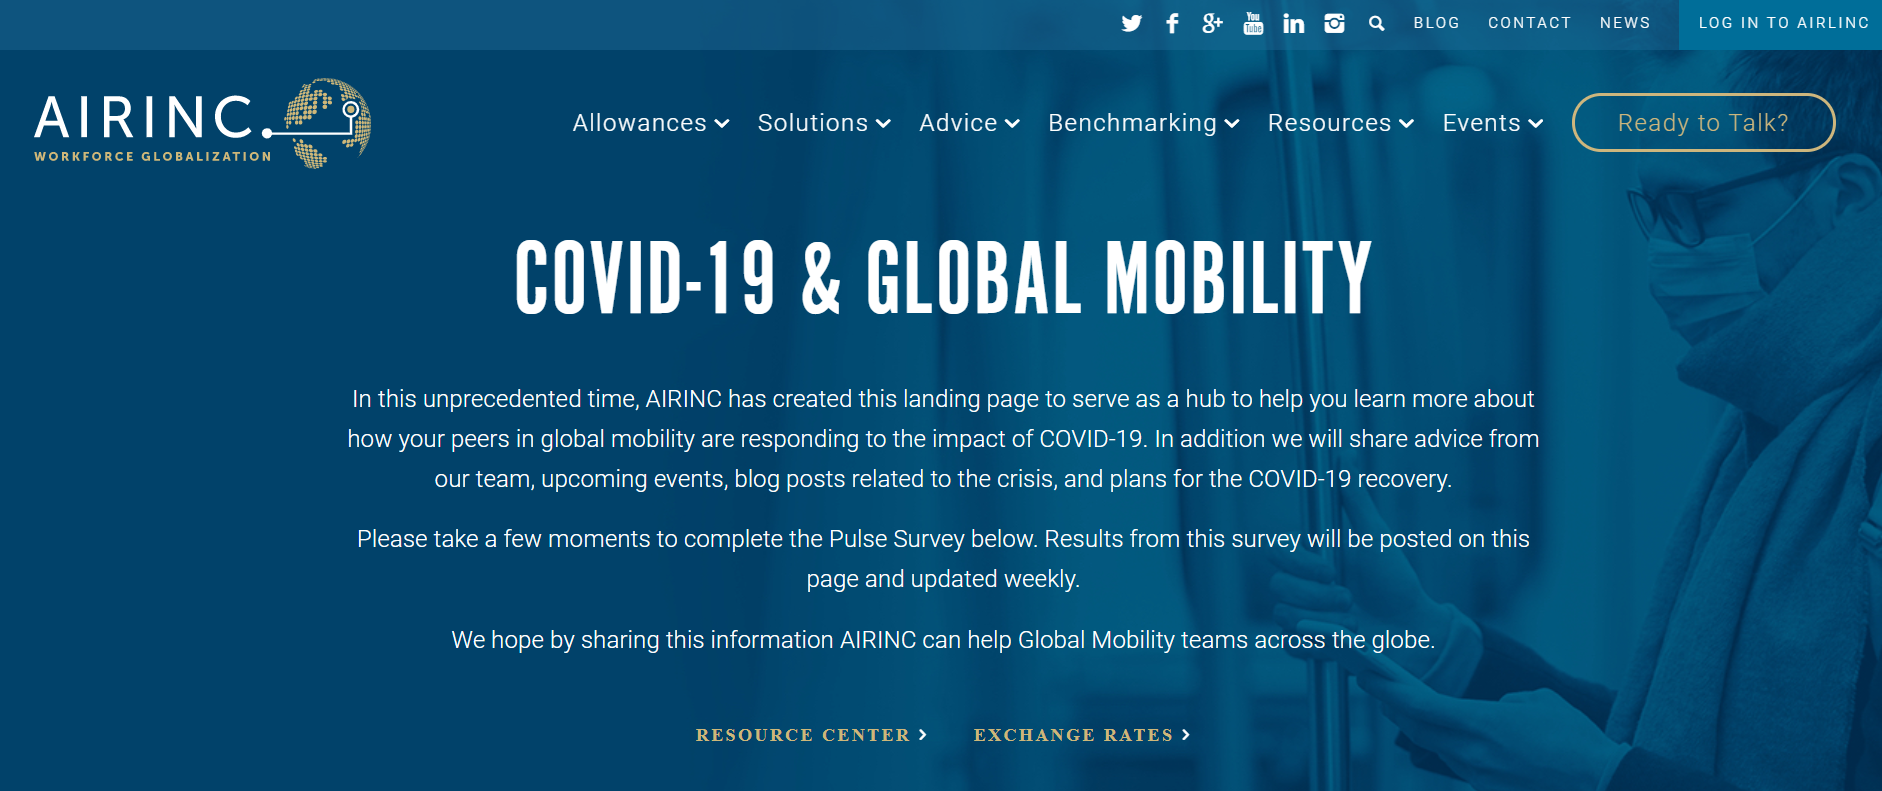 AIRINC COVID-19 Landing Page